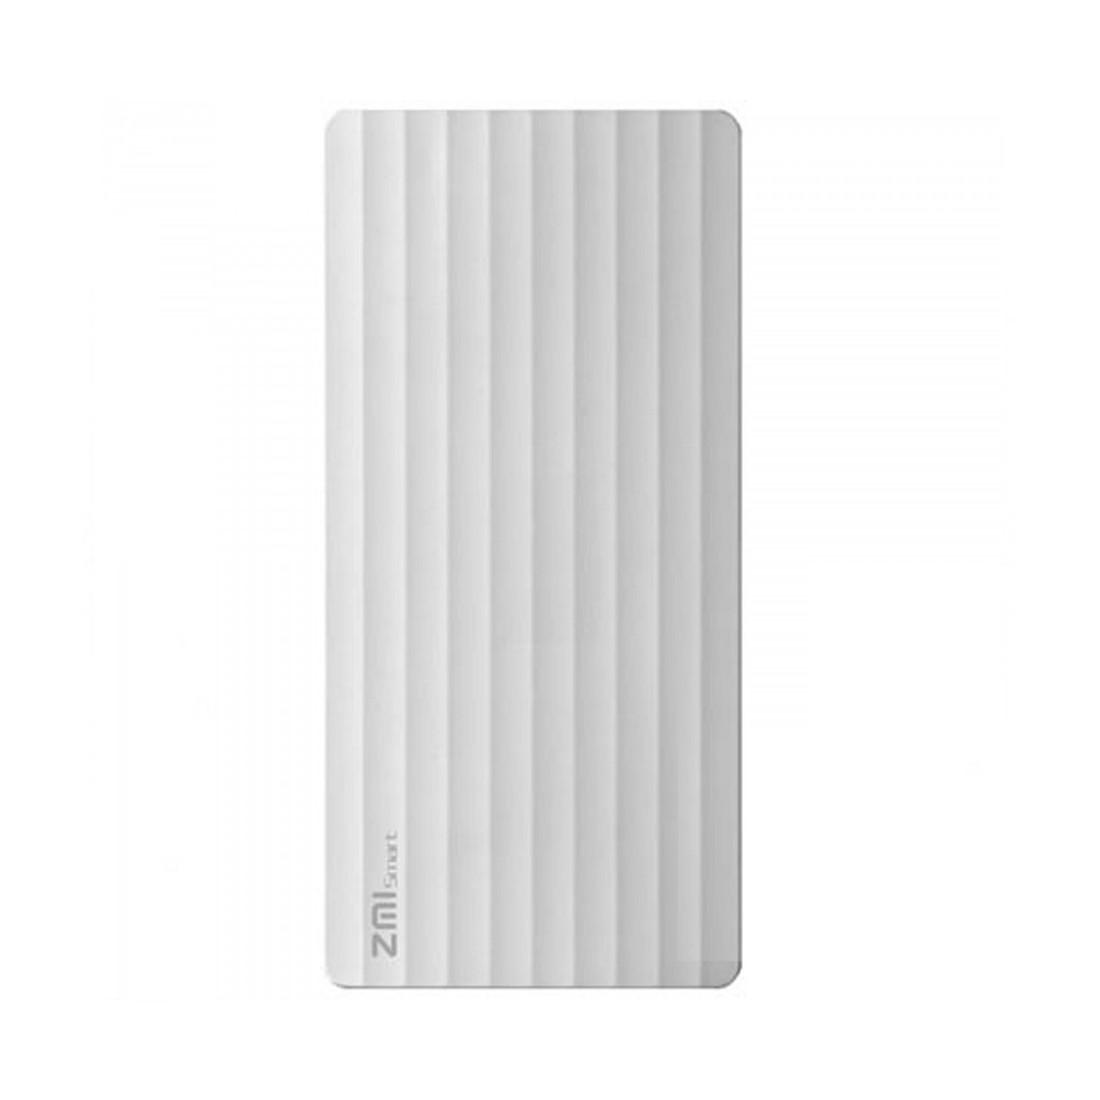 Портативное зарядное устройство, Xiaomi, ZMi Power Bank 10000 mAh PB810 (6934263400021), Выход USB: